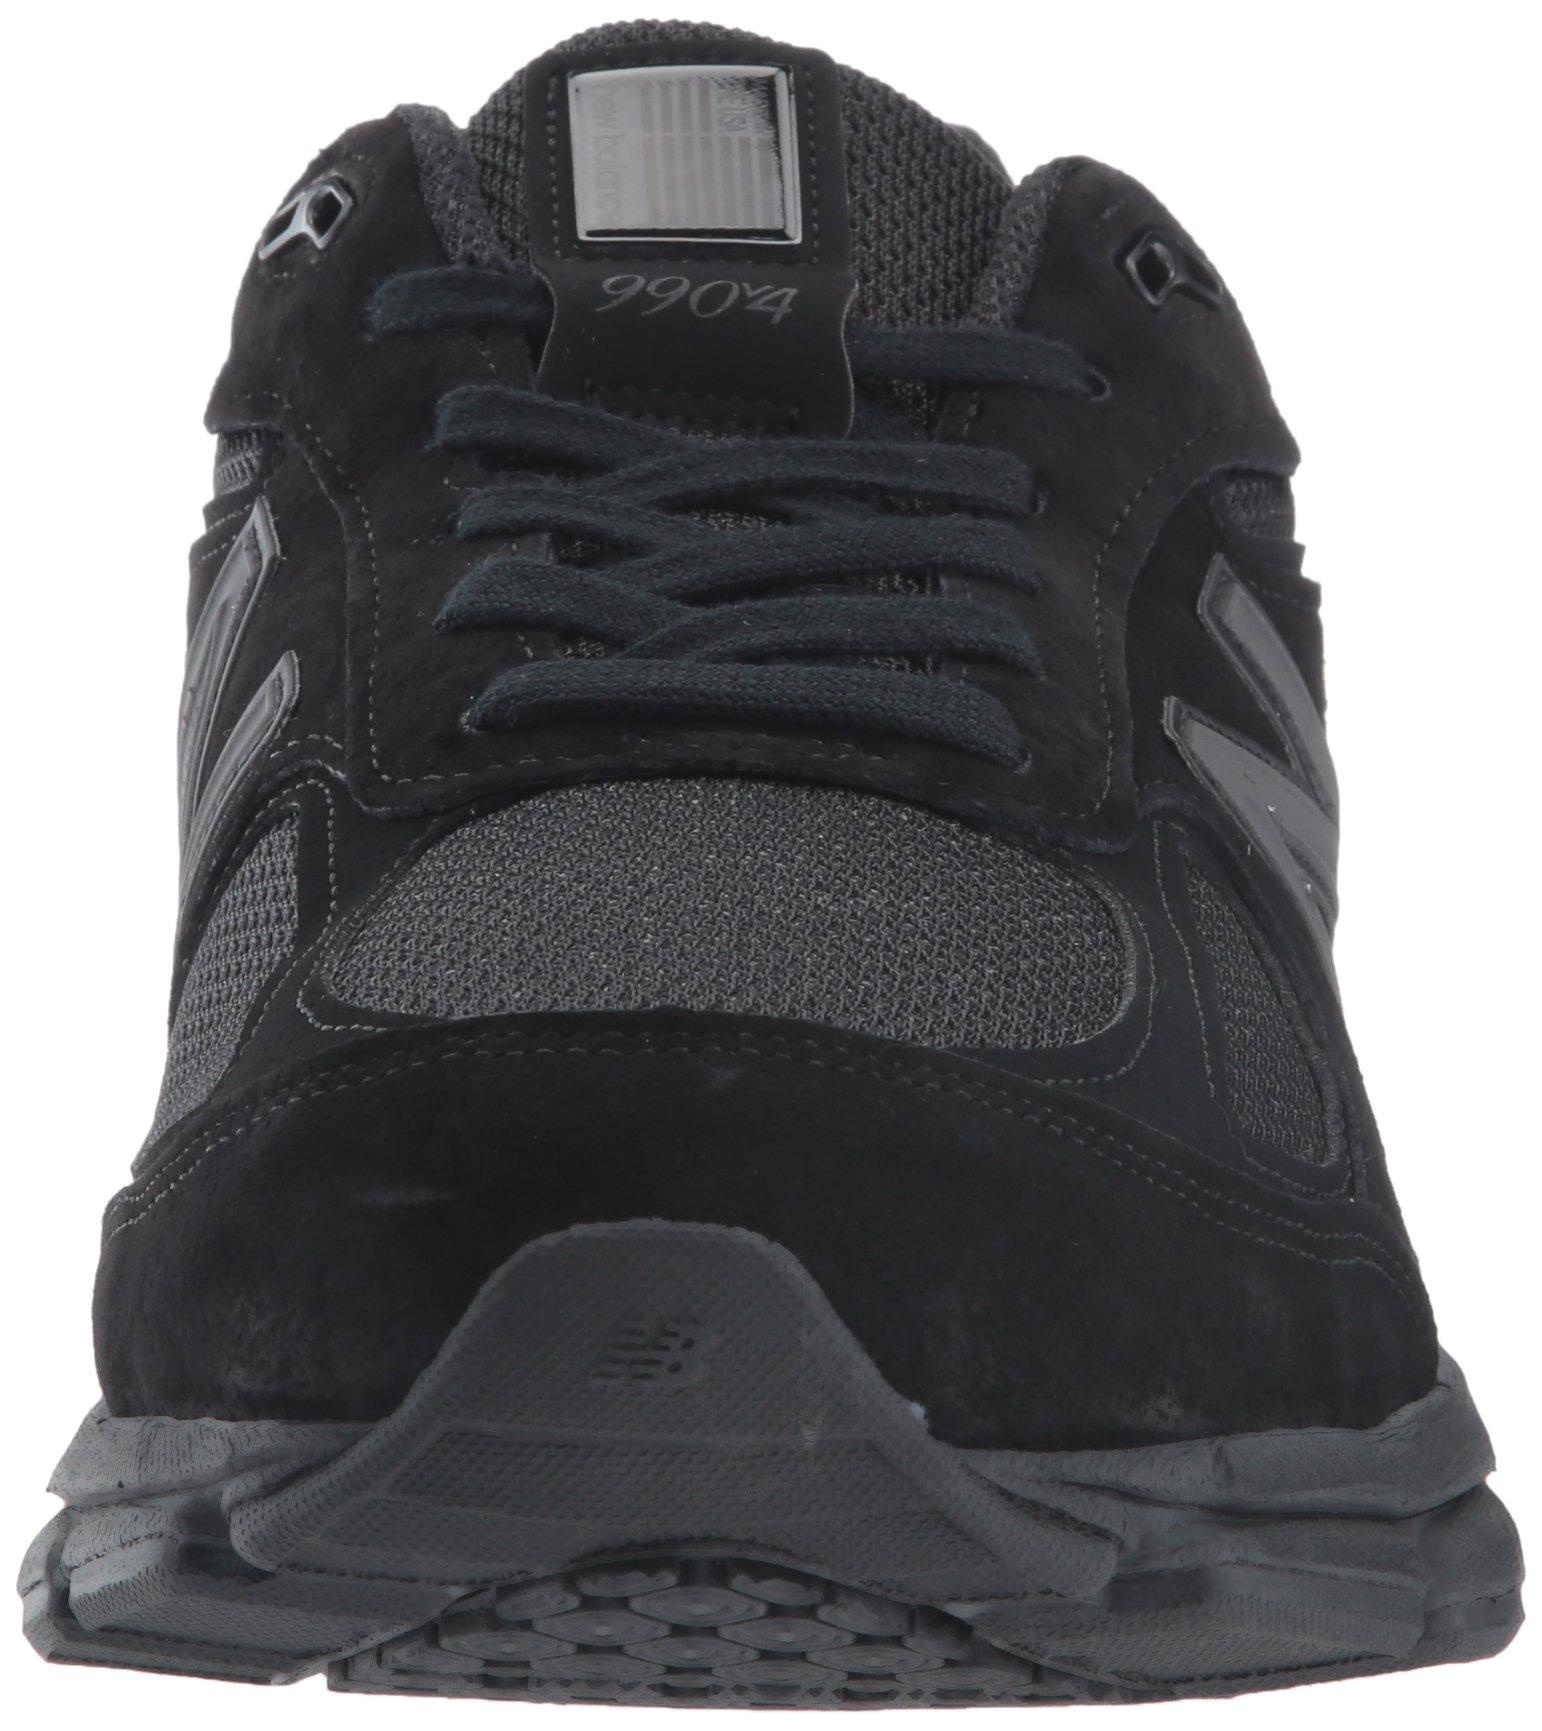 New Balance Men's 990V4 Running Shoe, Black/Black, 11 2E US by New Balance (Image #4)